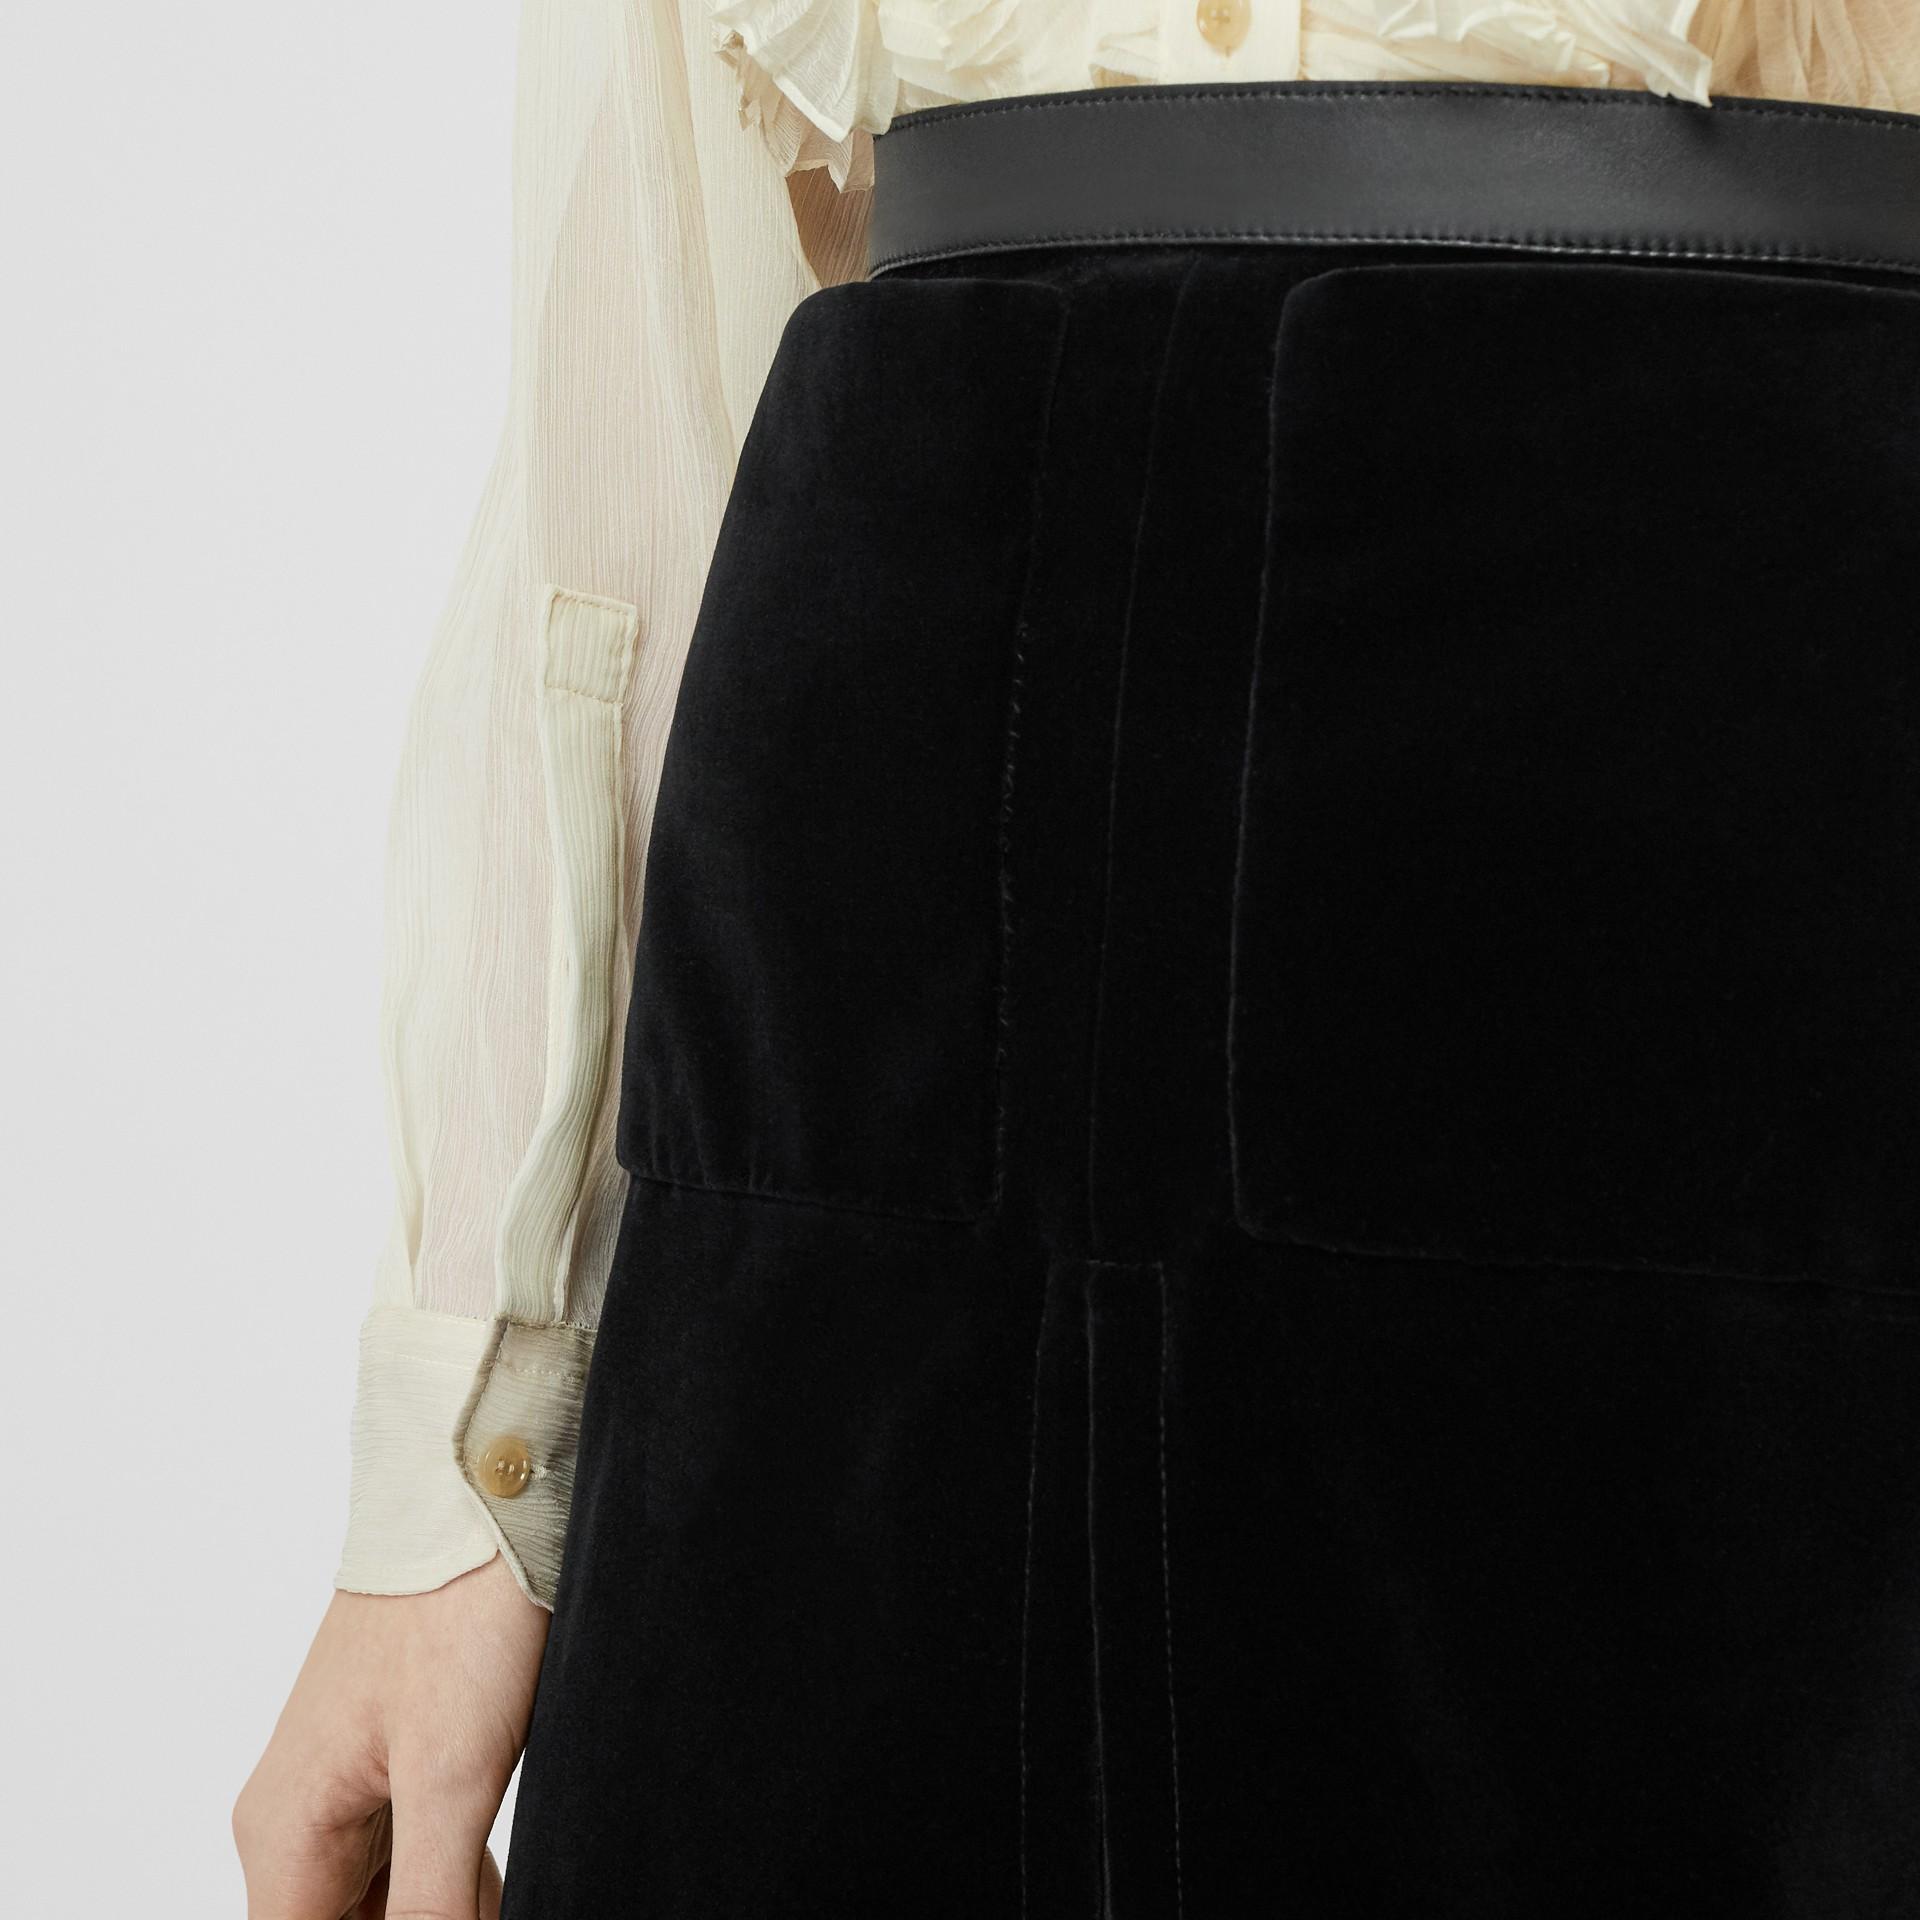 Lambskin Trim Box Pleat Detail Velvet and Wool Skirt in Black - Women | Burberry - gallery image 6